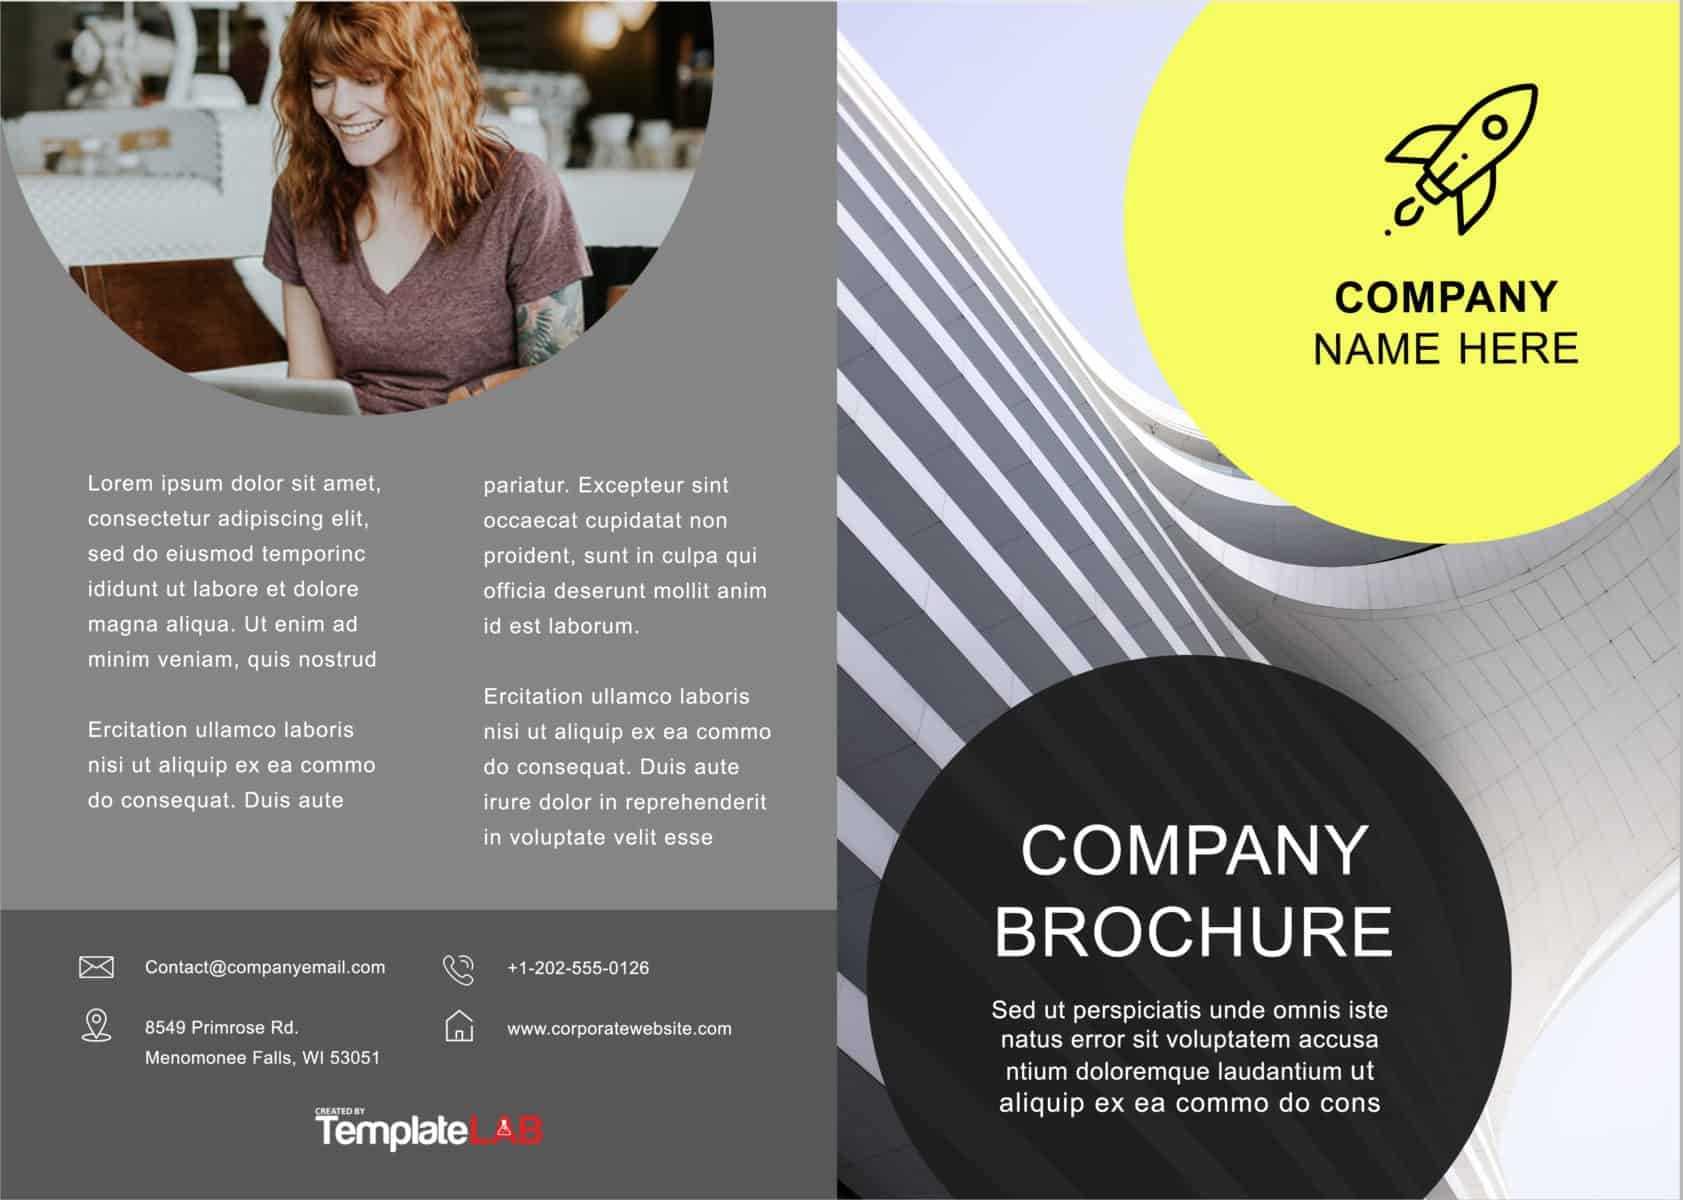 33 Free Brochure Templates (Word + Pdf) ᐅ Template Lab Throughout Free Brochure Template Downloads